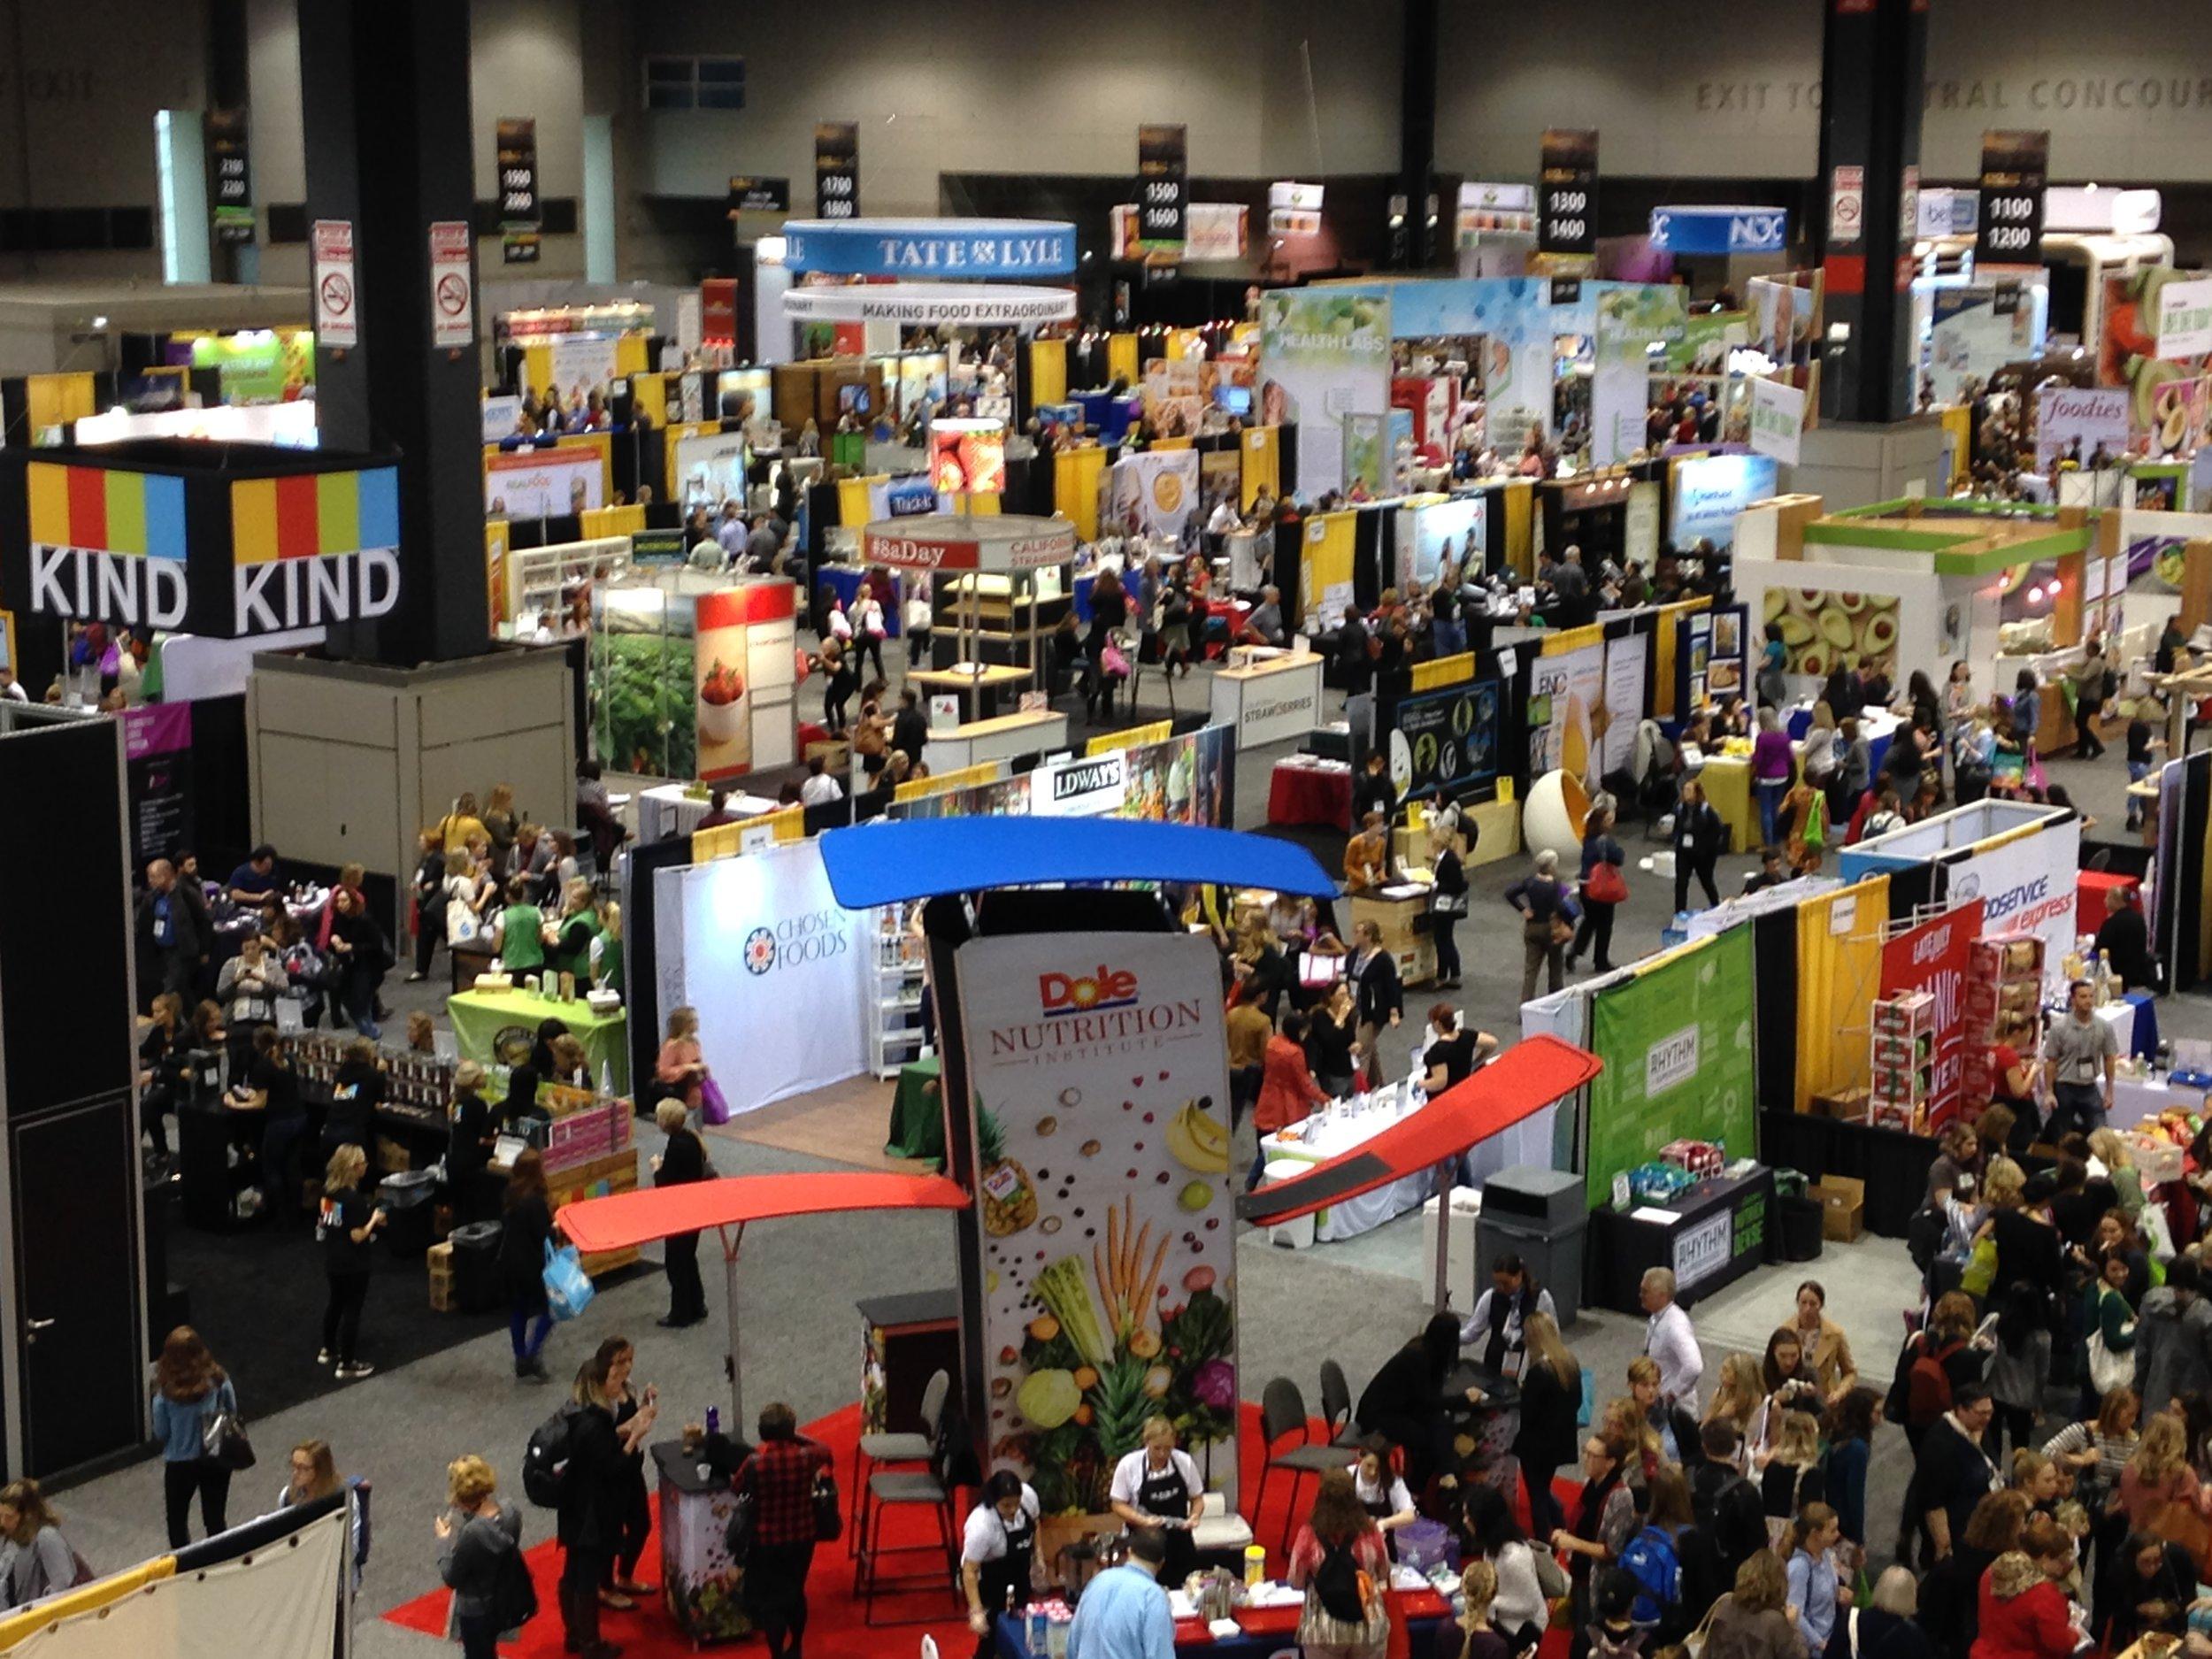 EDR Marketing Event Marketing Tradeshow Dayton, OH.JPG